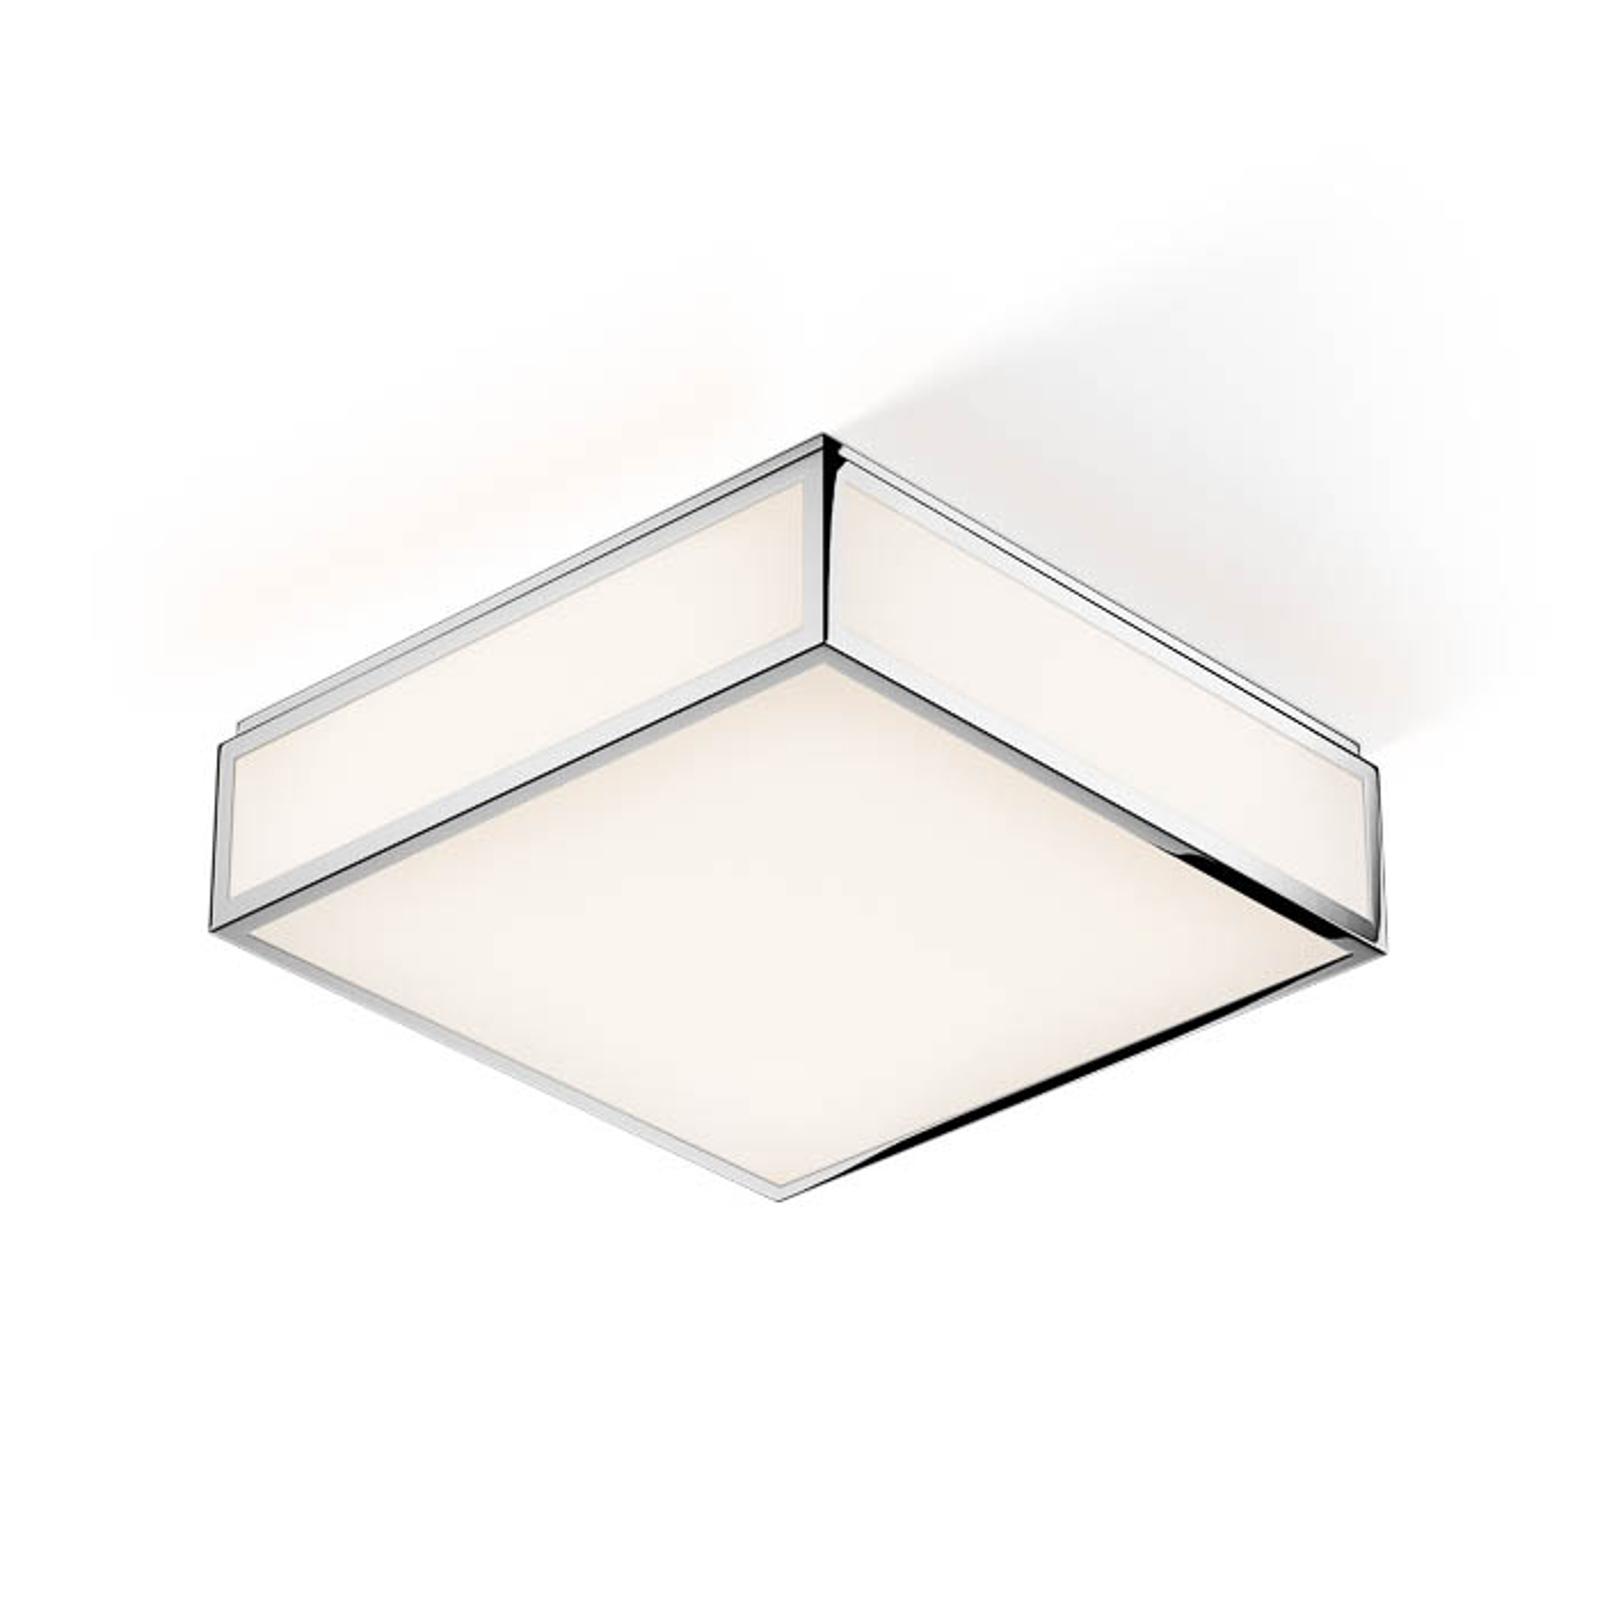 Decor Walther Bauhaus 3 N LED-Deckenleuchte chrom